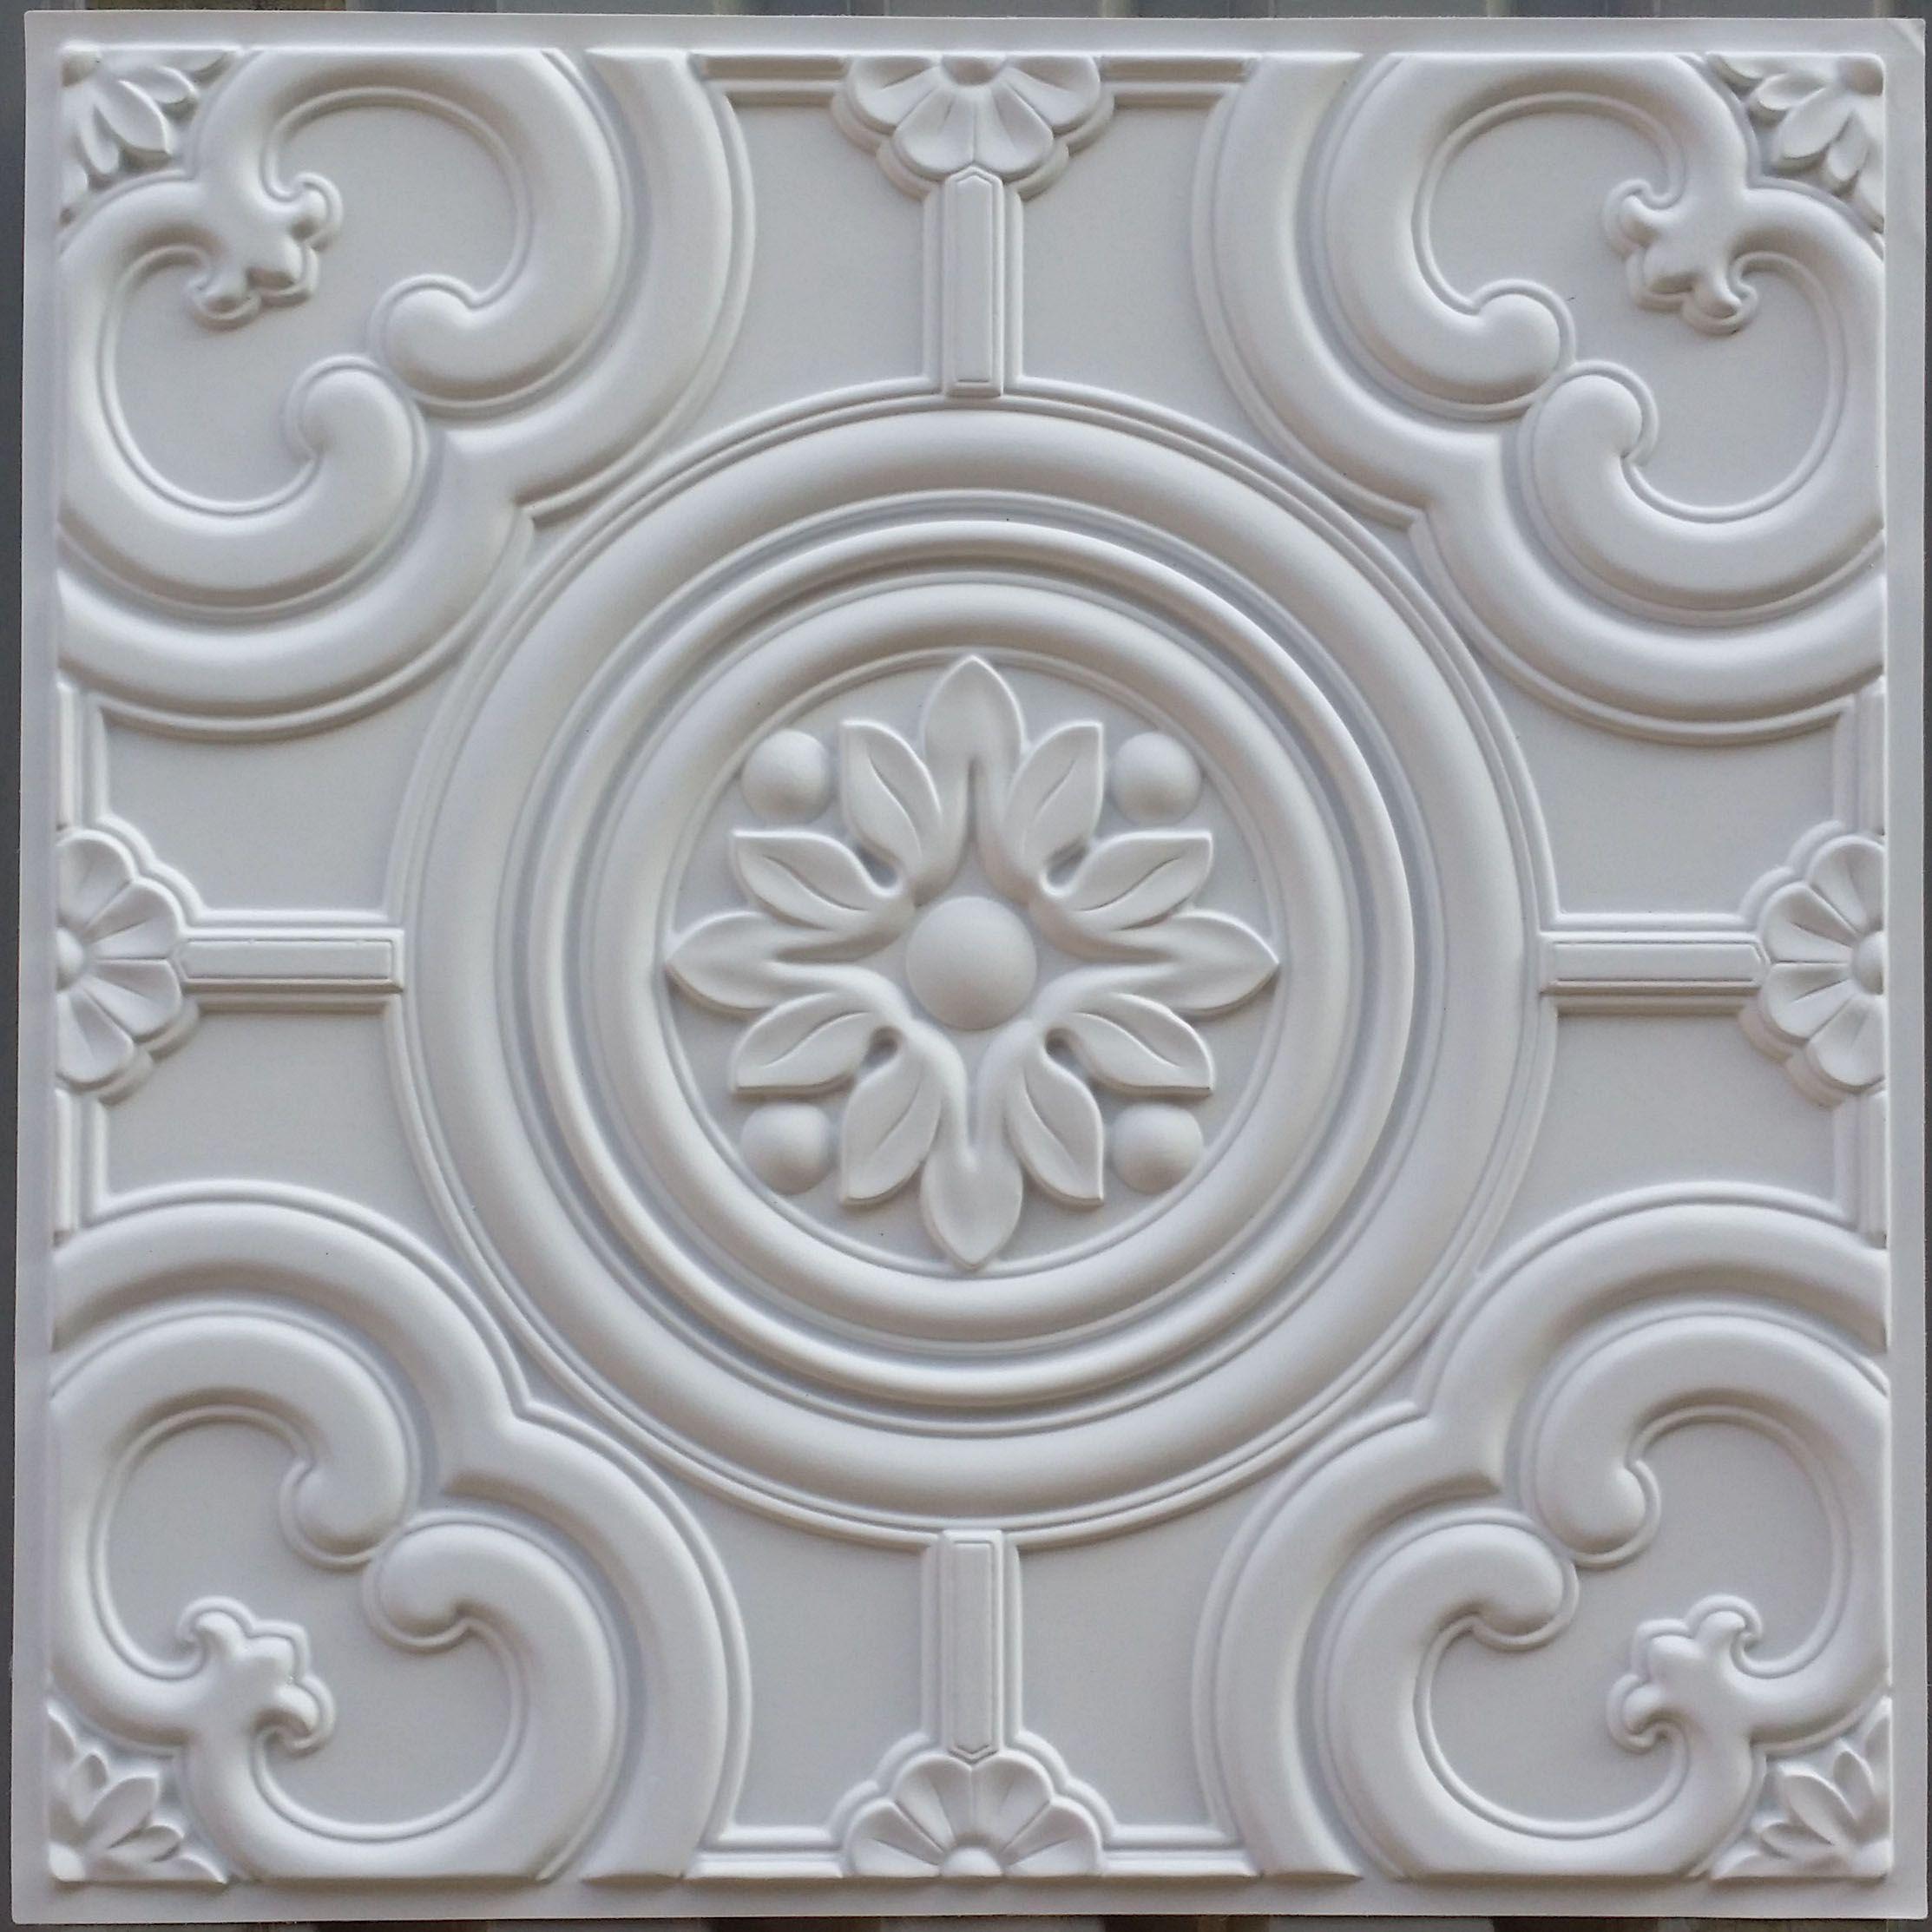 tiles in up drop decorative download ceiling plastic ceilings cei tile ideas glue